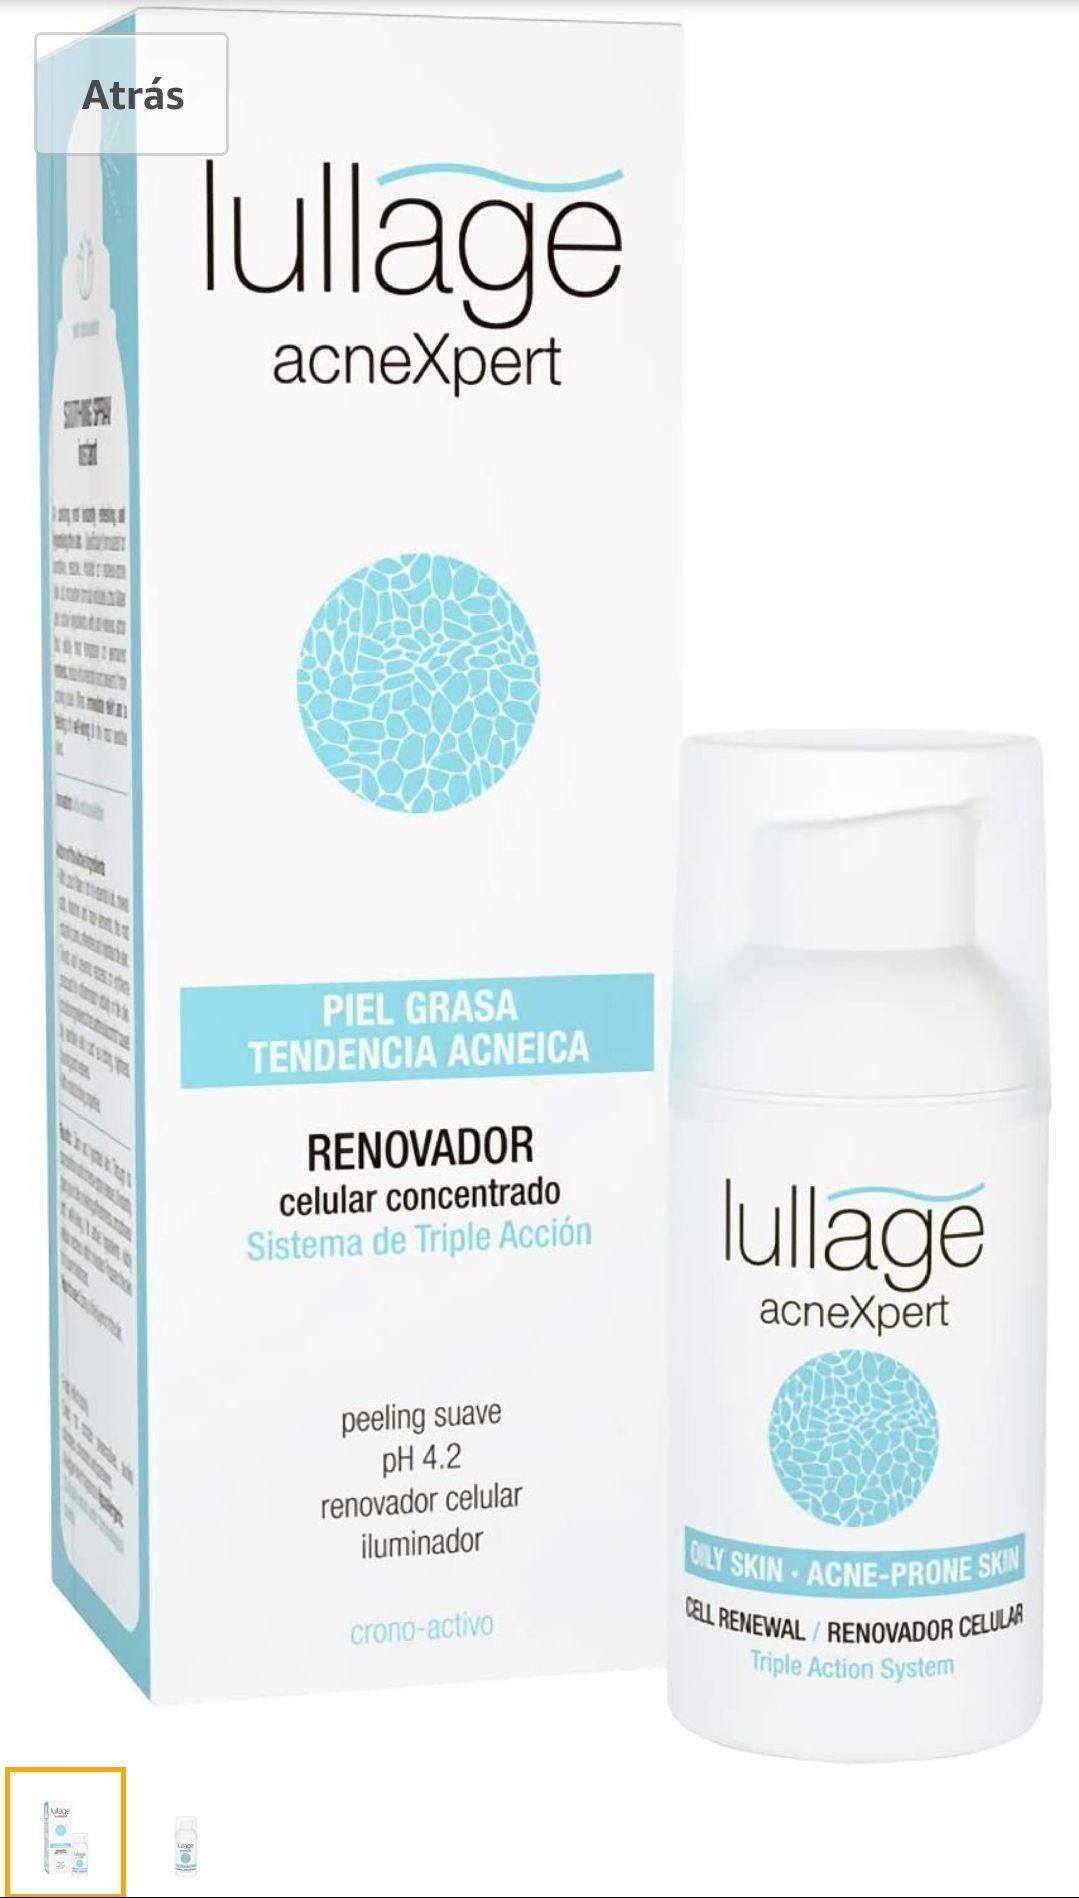 Lullage acneXpert Renovador Celular Concentrado exfoliante en gel